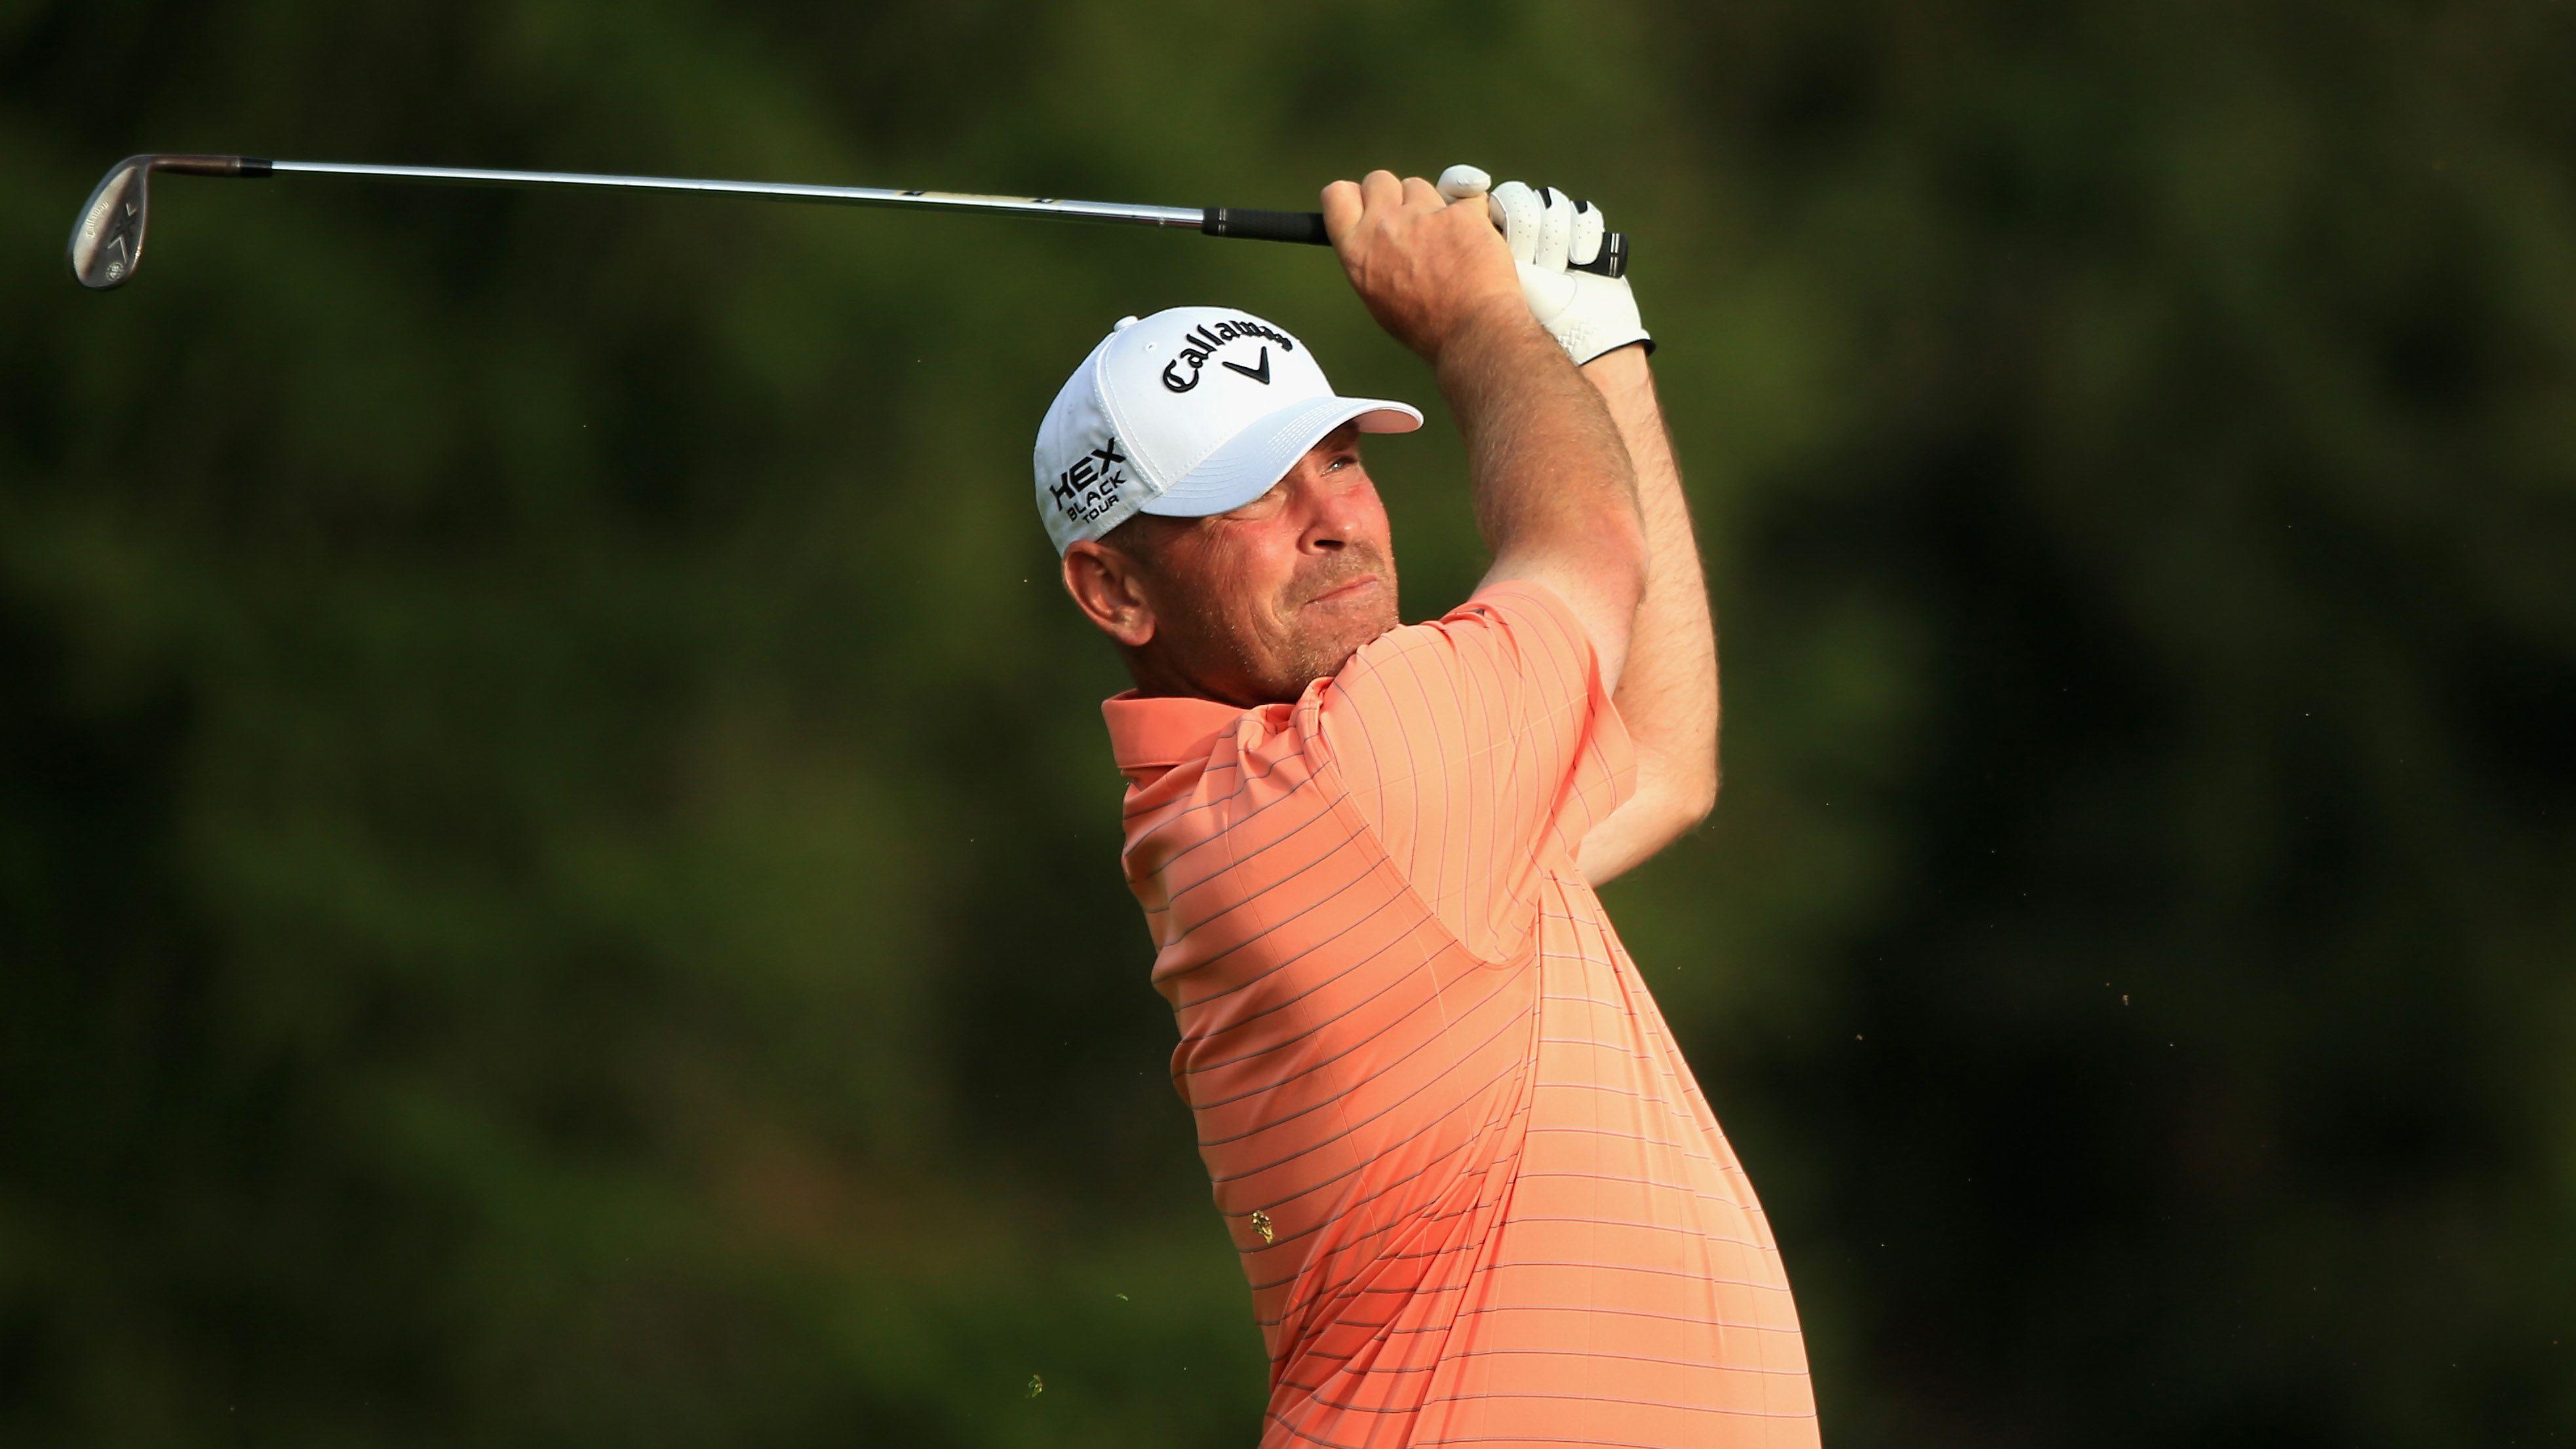 Bjorn also won the European Masters in 2011.